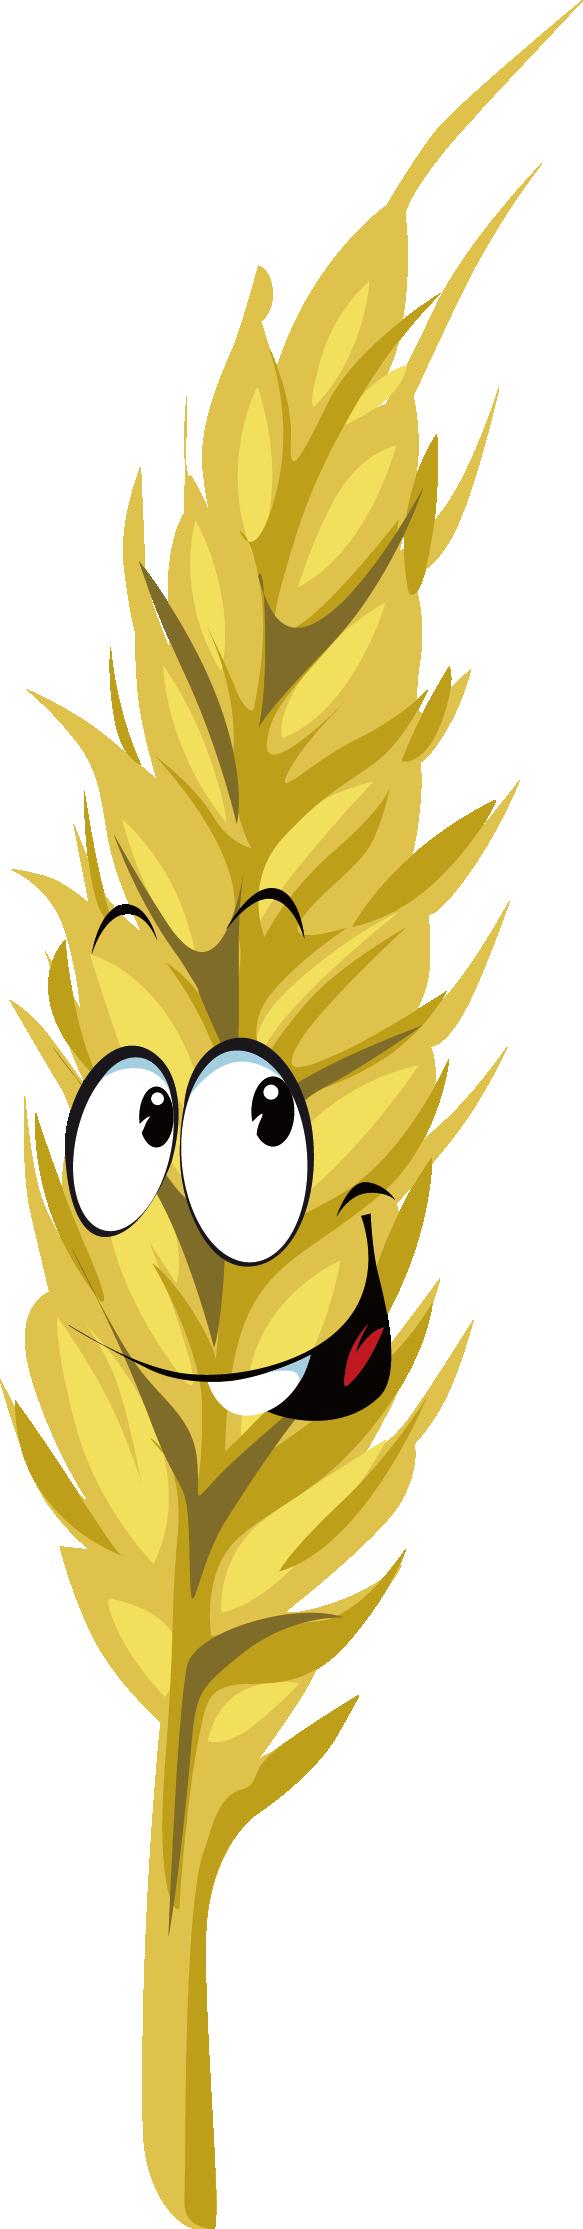 Grain clipart wheat head. Cartoon drawing royalty free